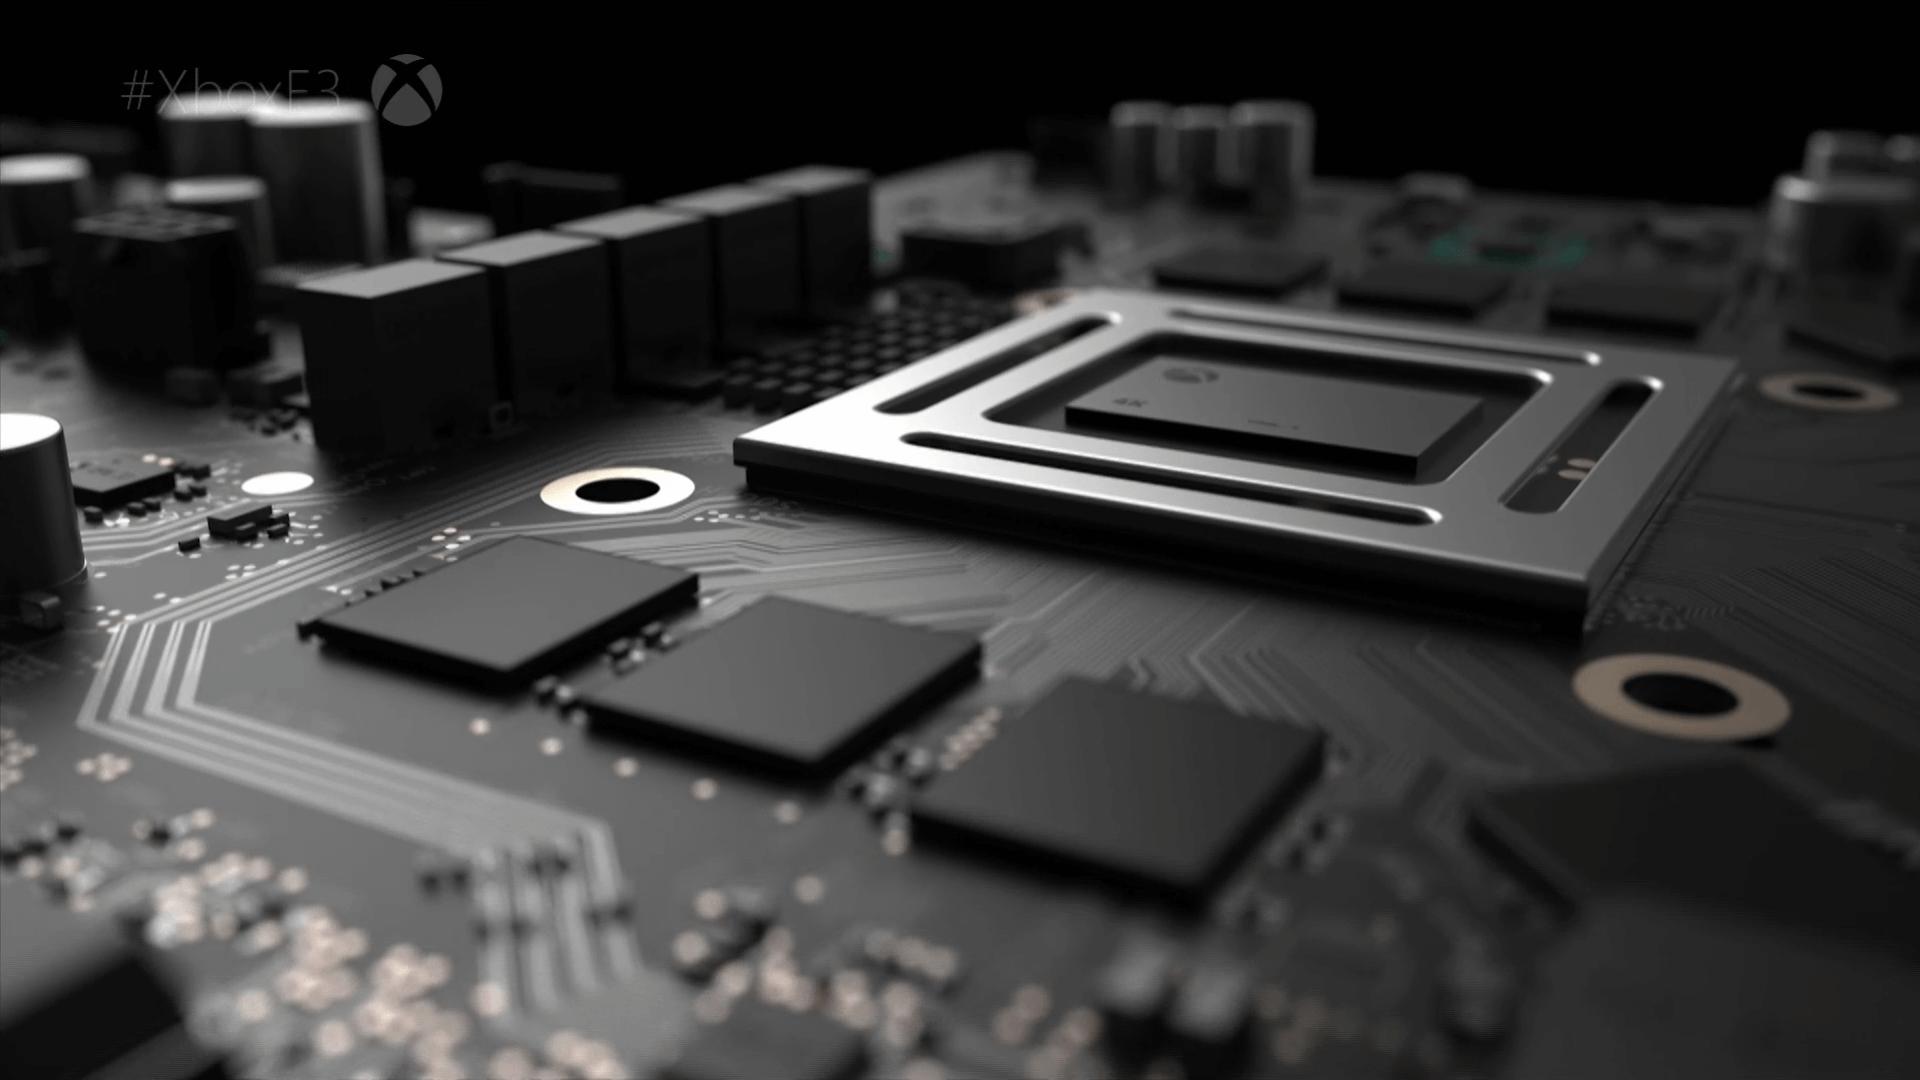 General 1920x1080 Project Scorpio Microsoft Xbox CPU